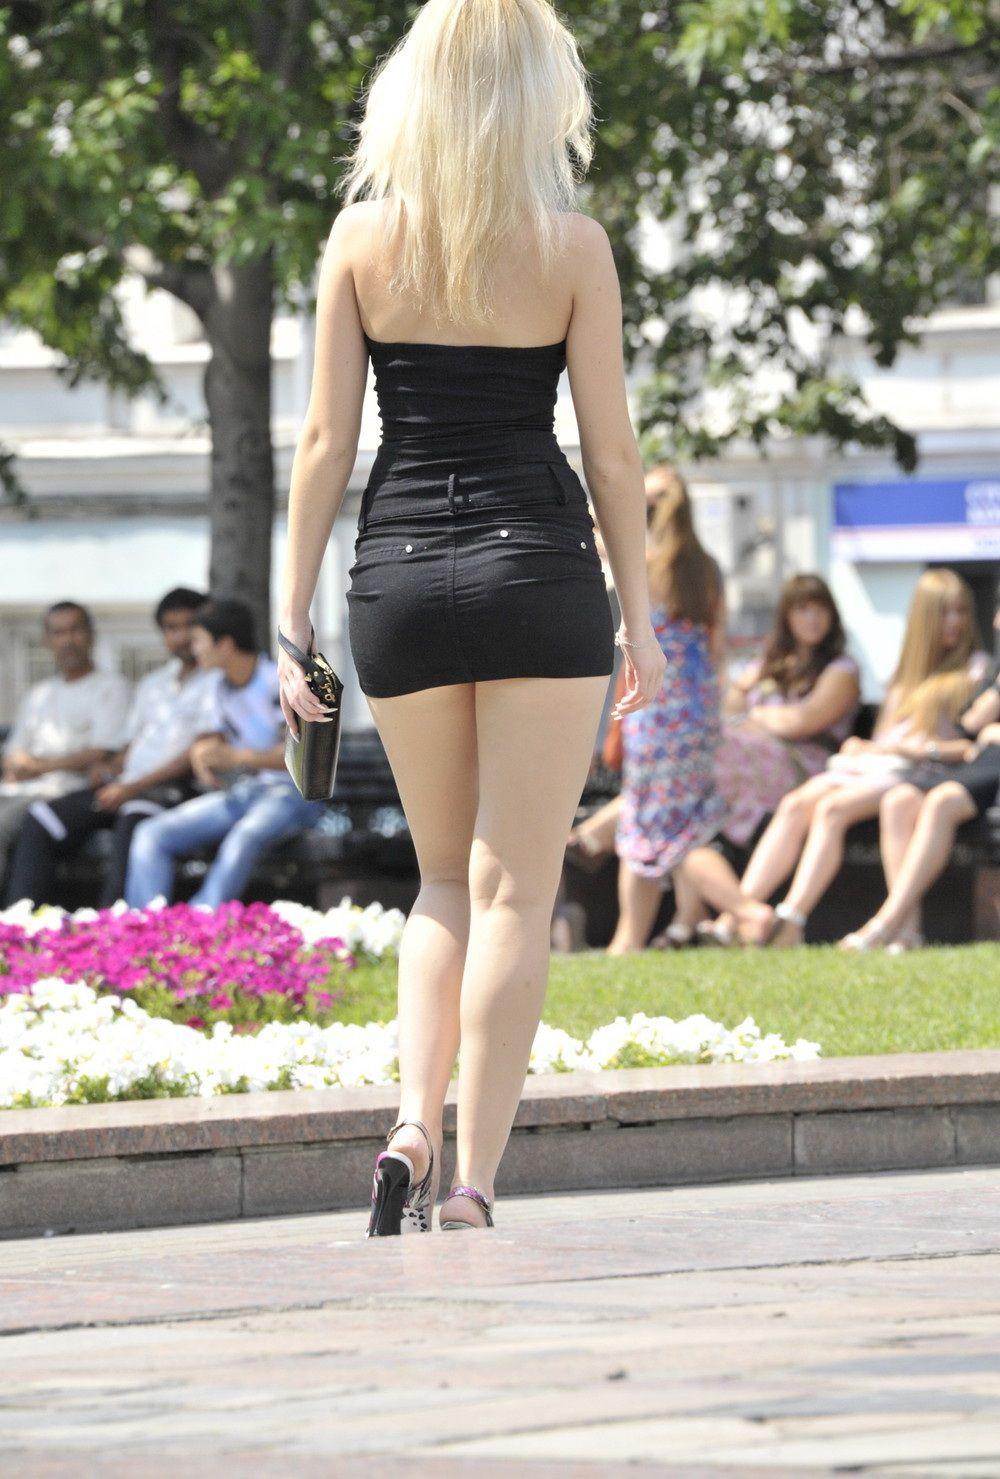 Фото девушки в парке в кожаной мини юбки 28 фотография